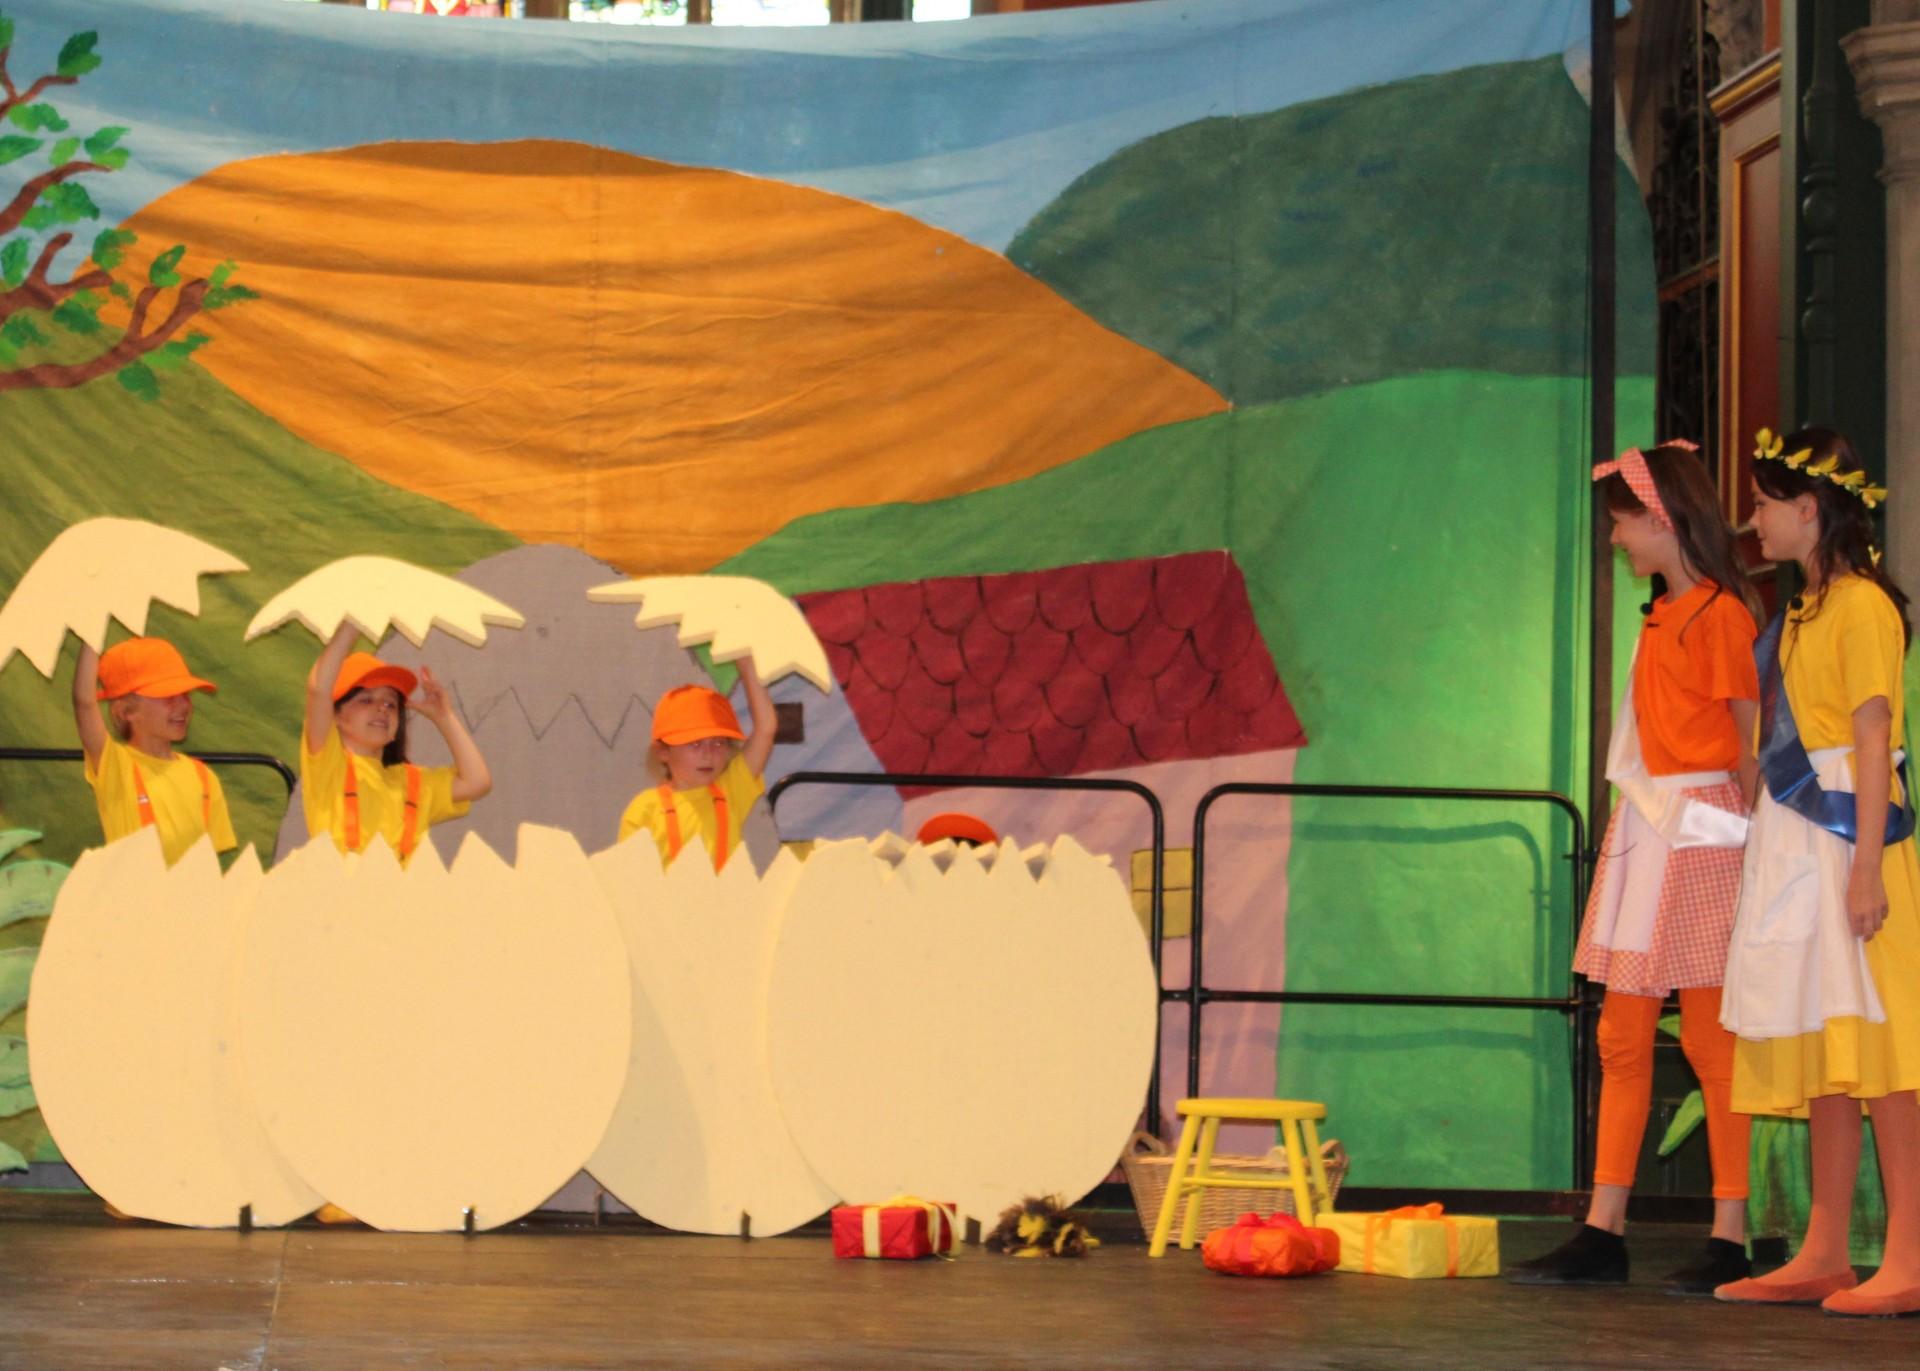 Sensational performances at the CBPPS Summer Show!